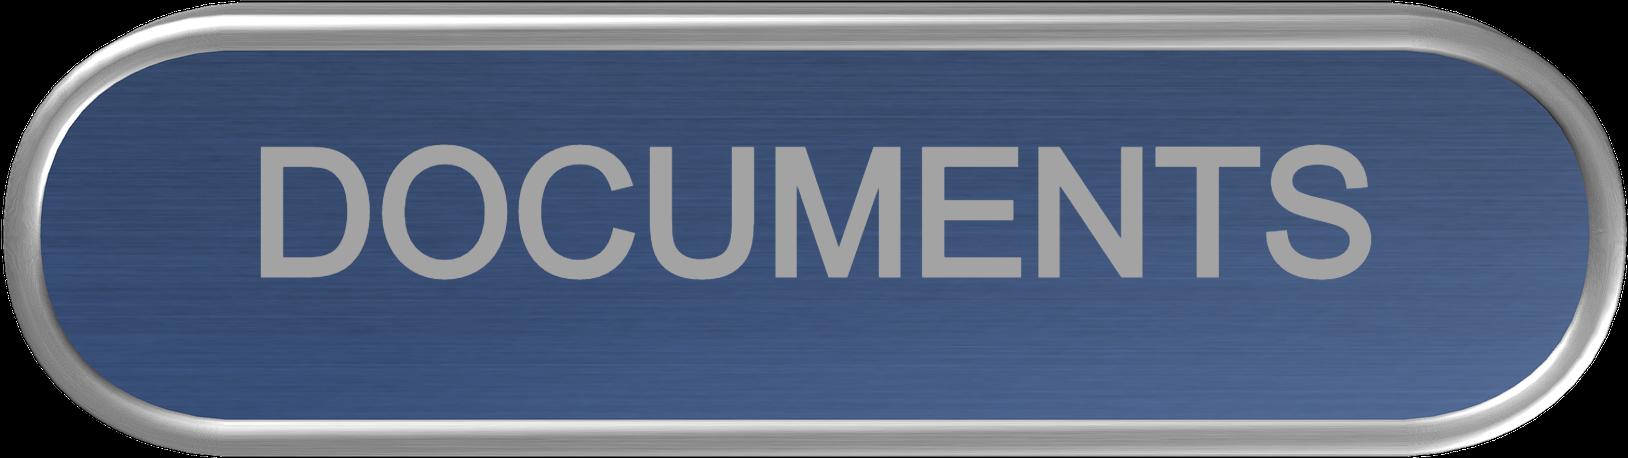 documentsbutton